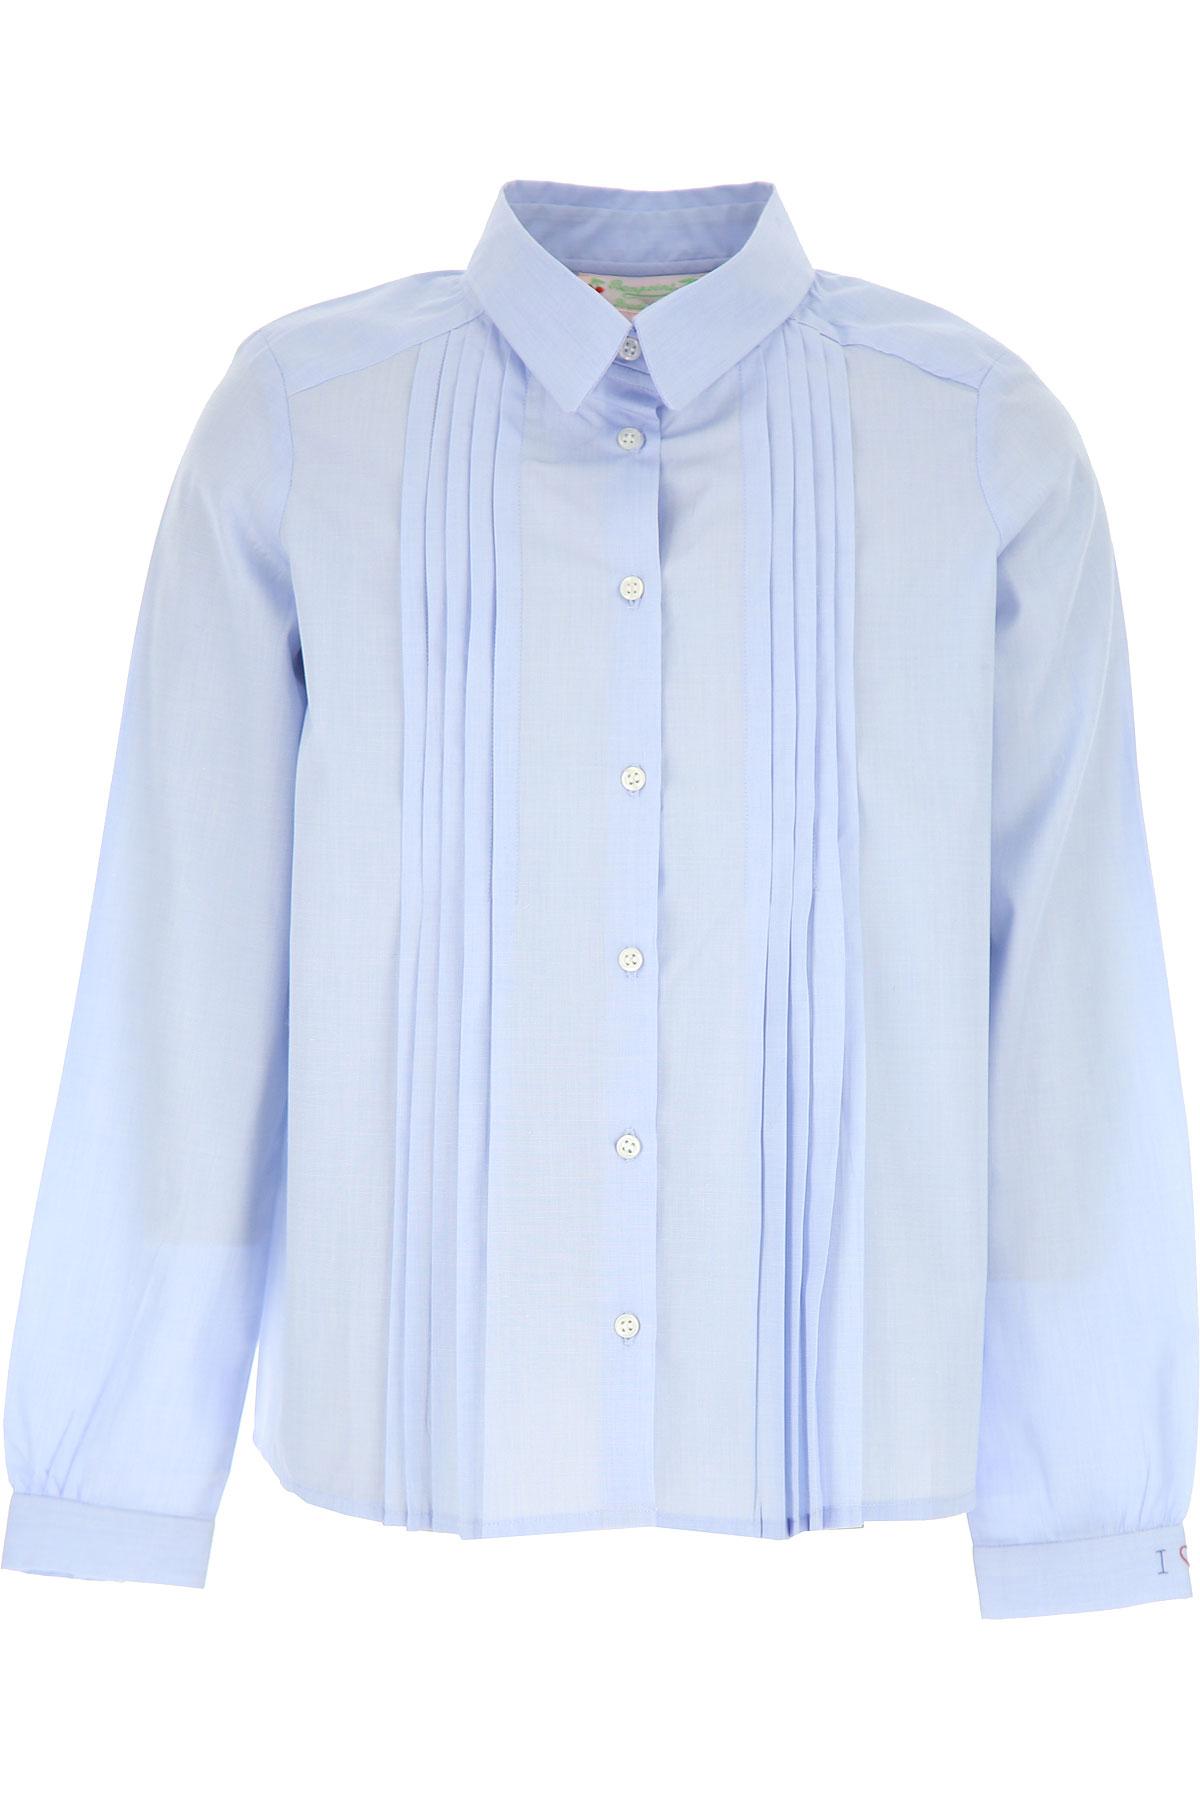 Bonpoint Kids Shirts for Girls On Sale, Heavenly, Cotton, 2019, 10Y 12Y 14Y 8Y